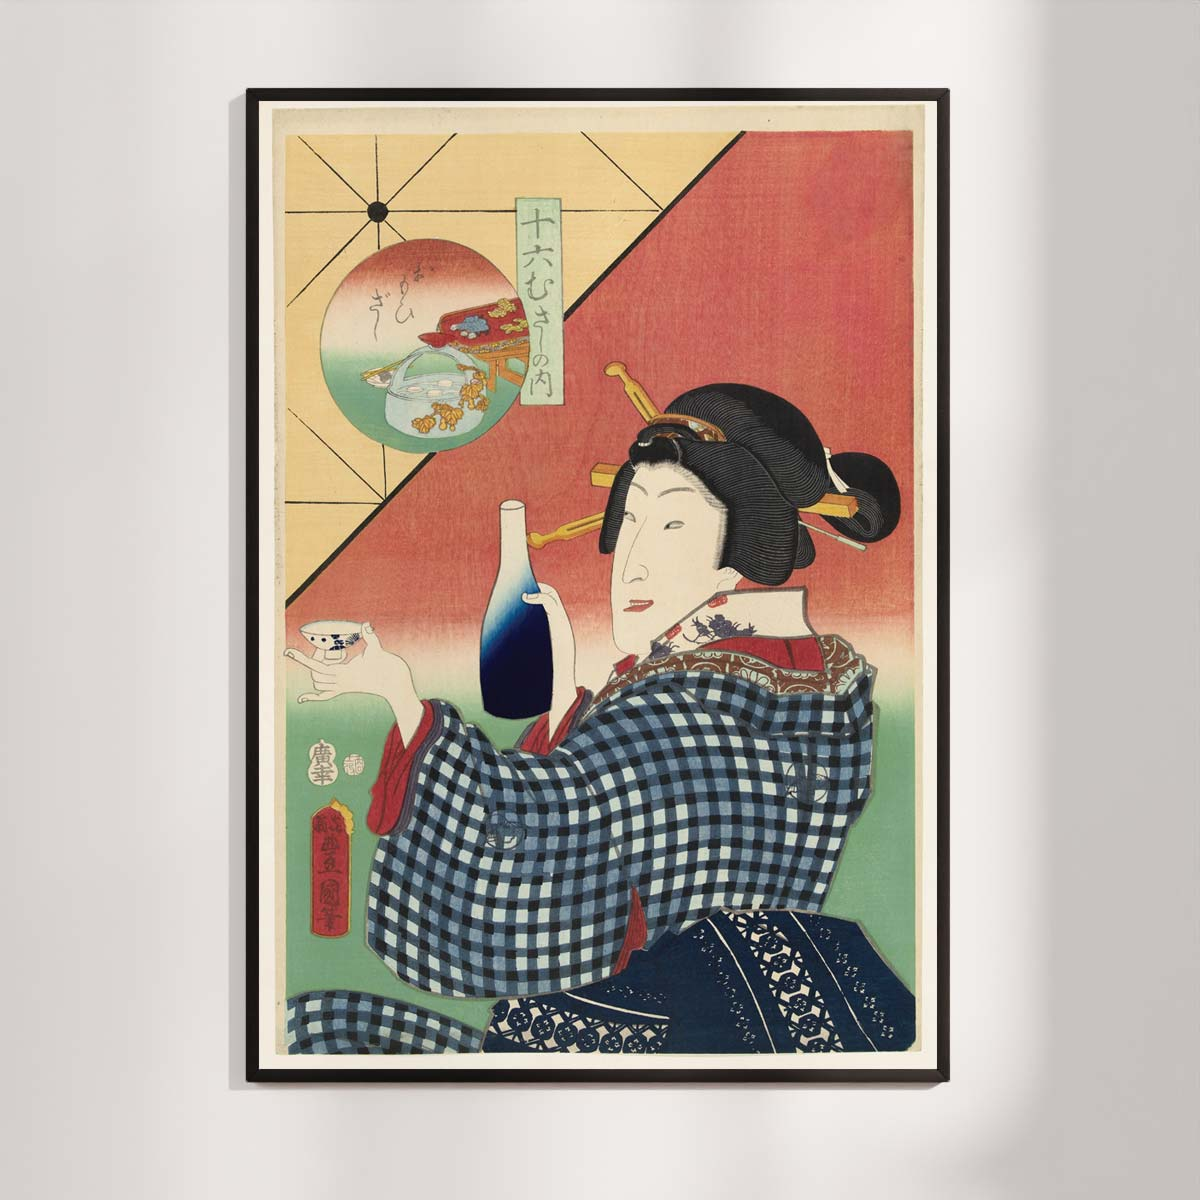 Plakat - Japansk træsnit - Cheers to me